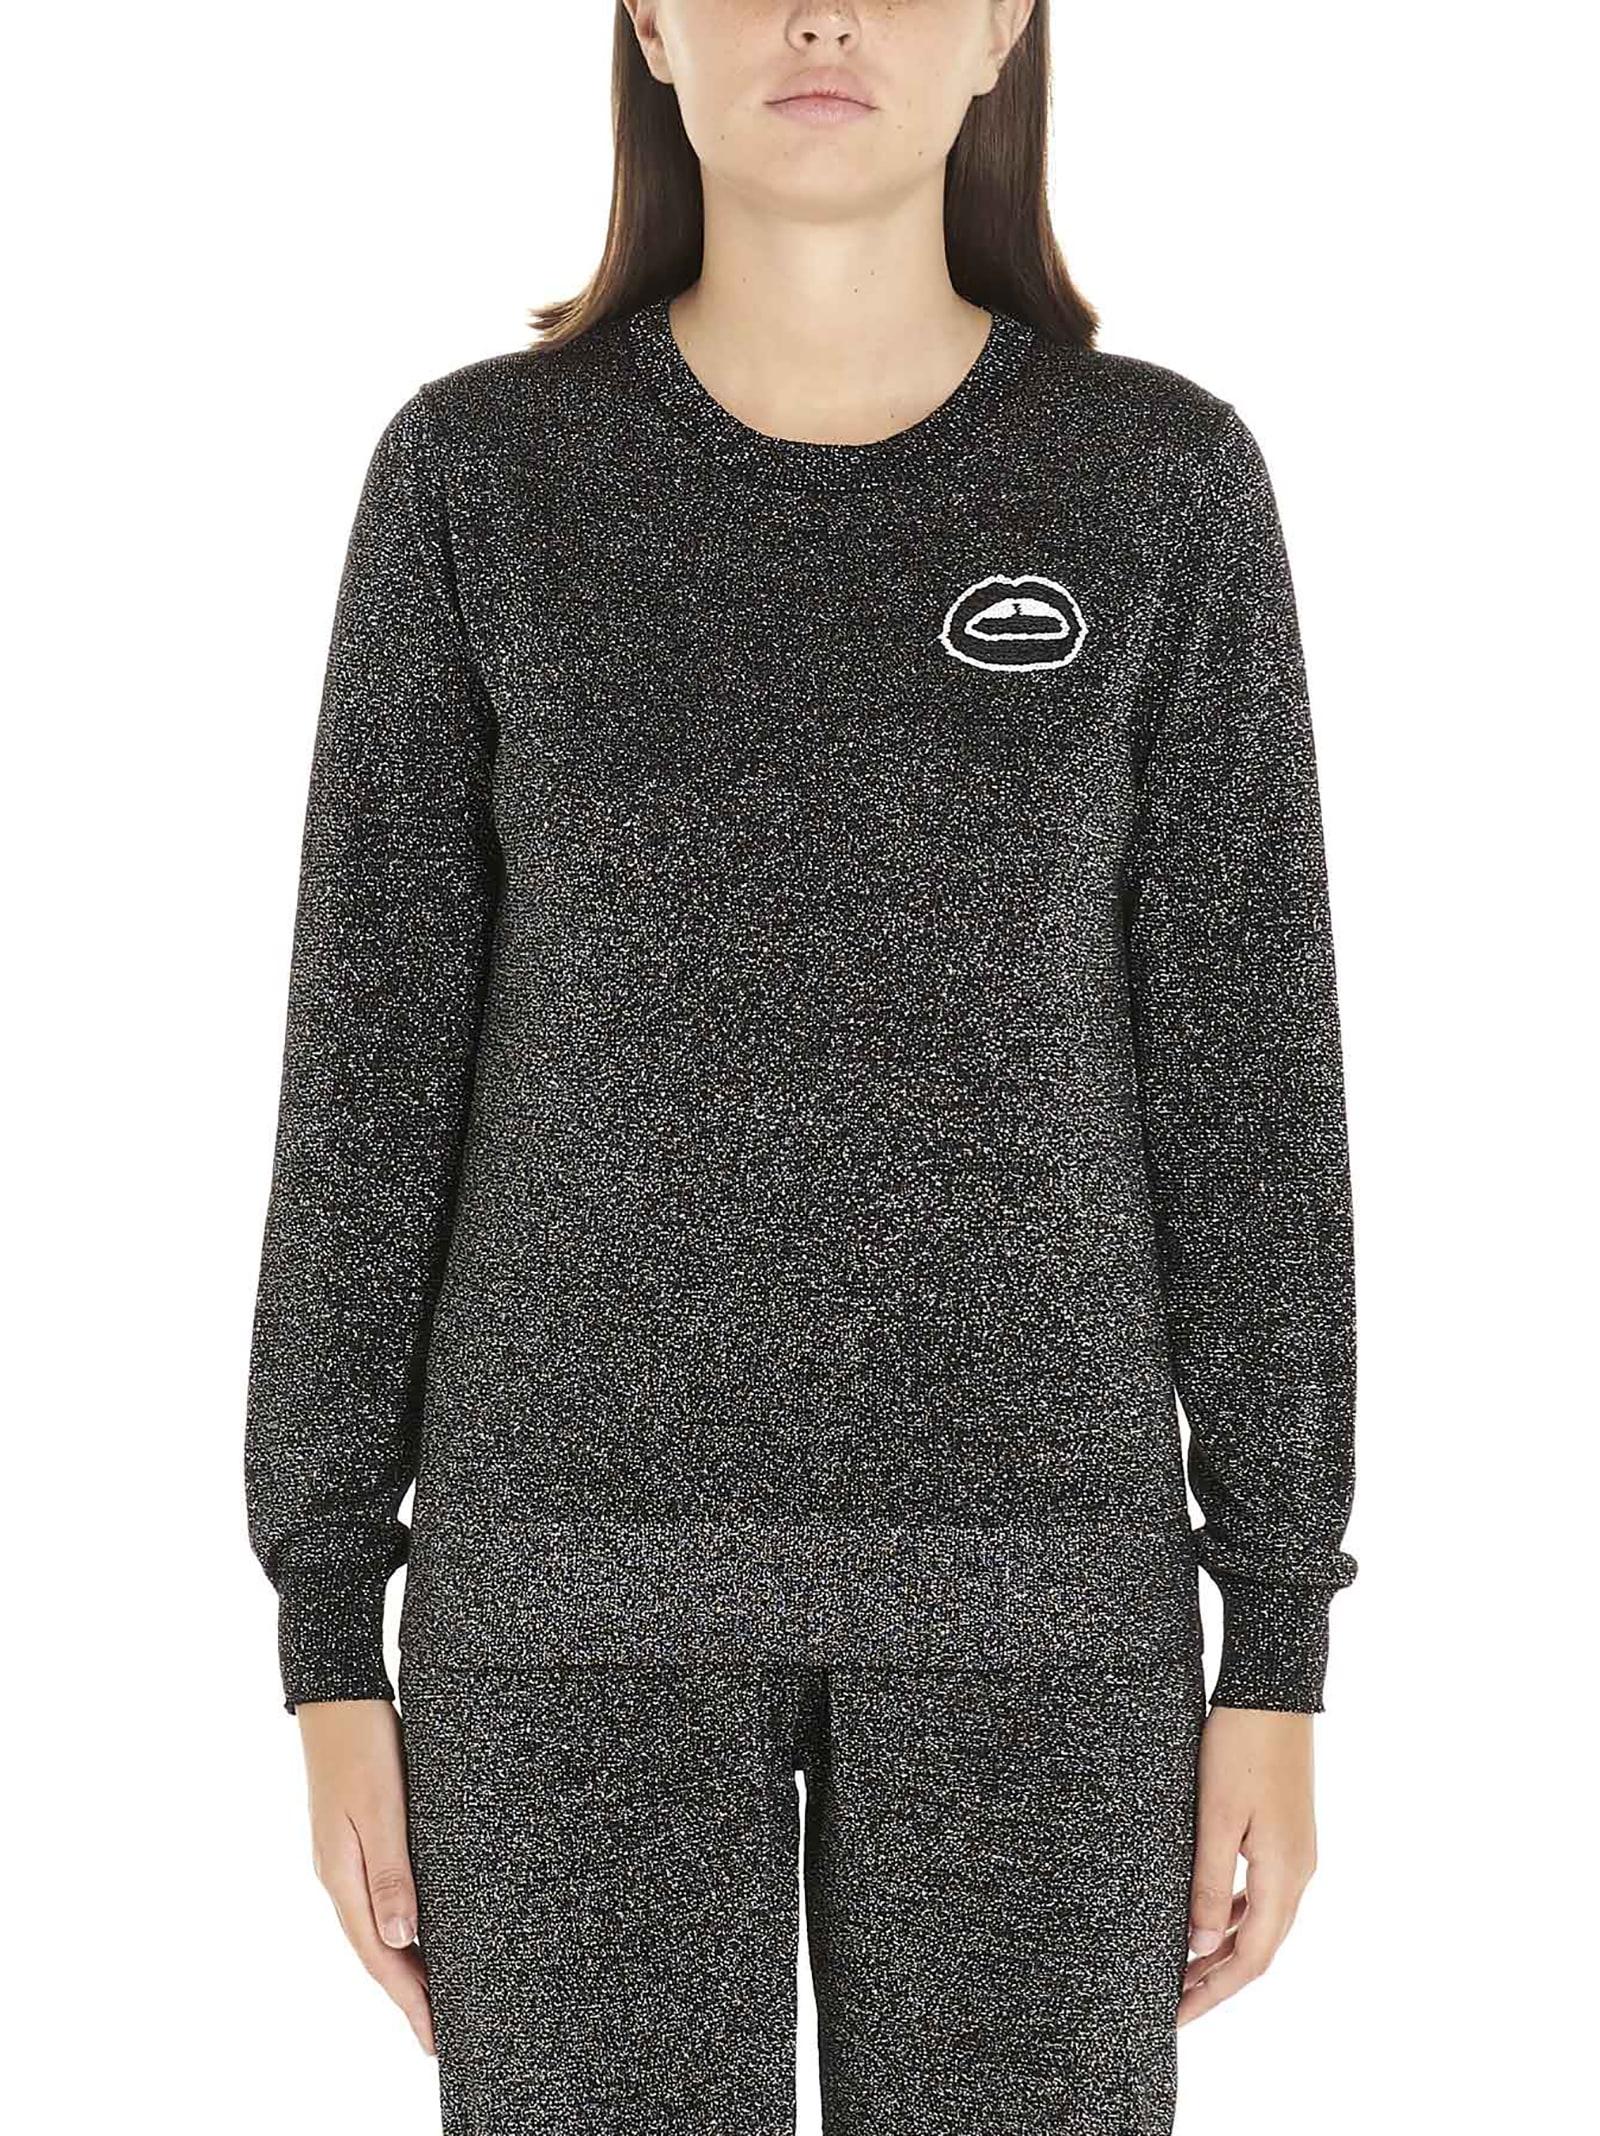 tracy Sequin Lara Lip Lurex Sweatshirt